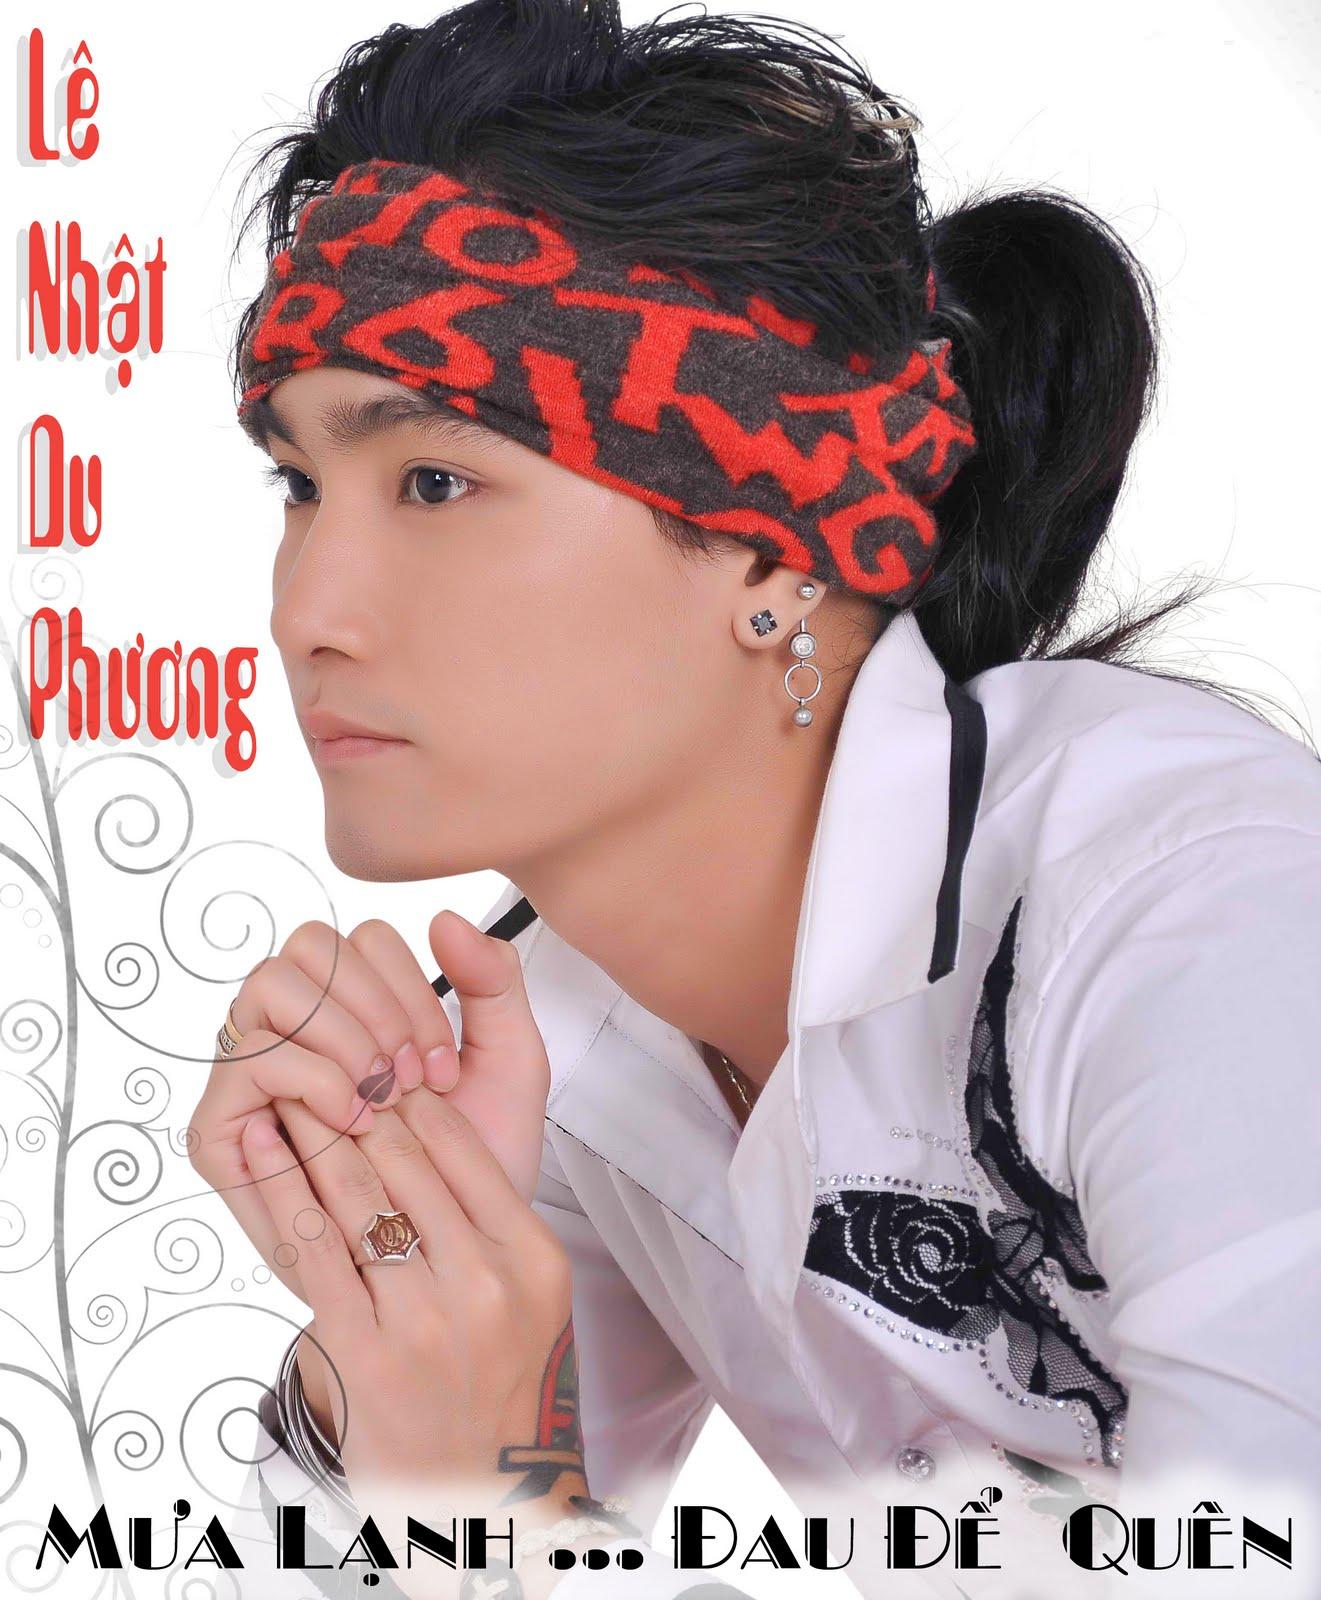 Nhac Vinh Thuyen Kim Moi Nhat 2011